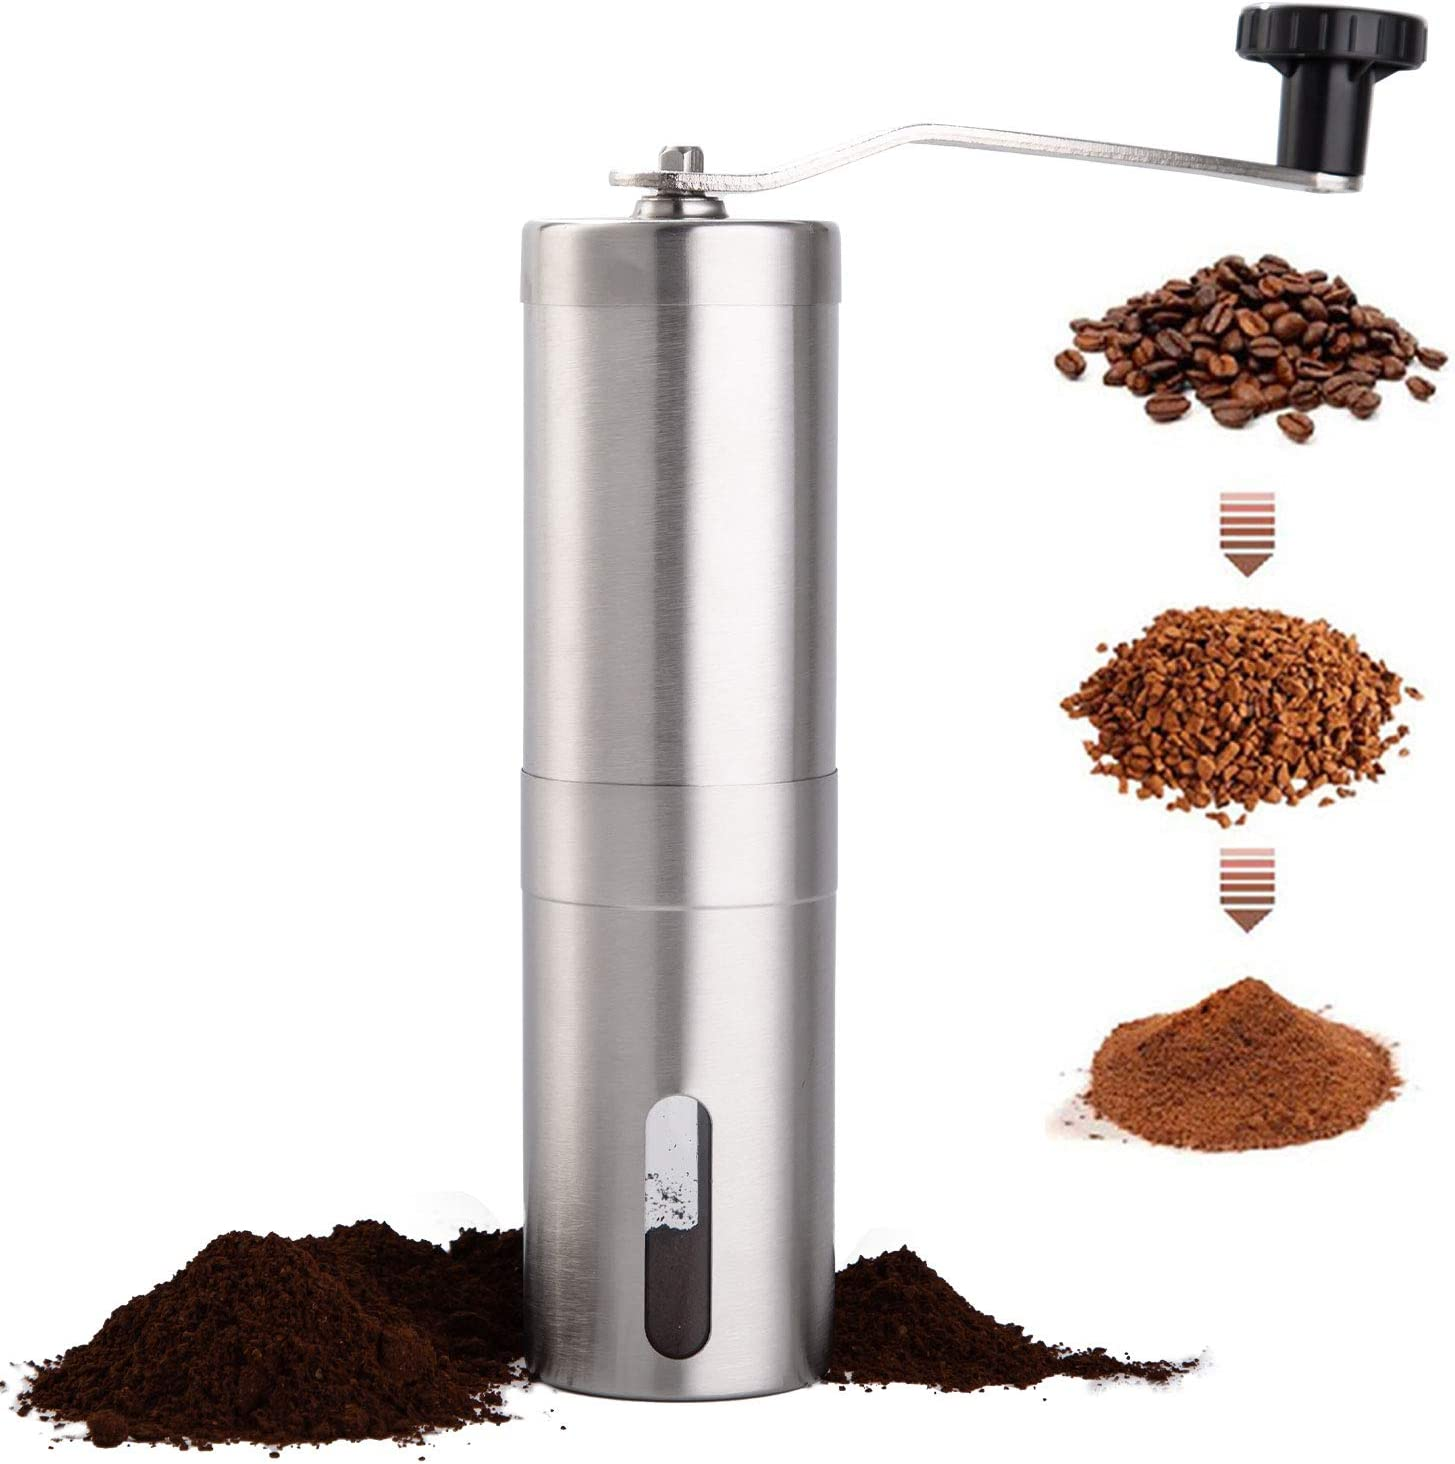 PARACITY Manual Coffee Bean Grinder, Stainless Steel Hand Coffee Mill Ceramic Burr for Aeropress, Drip Coffee, Espresso, French Press, Turkish Brew